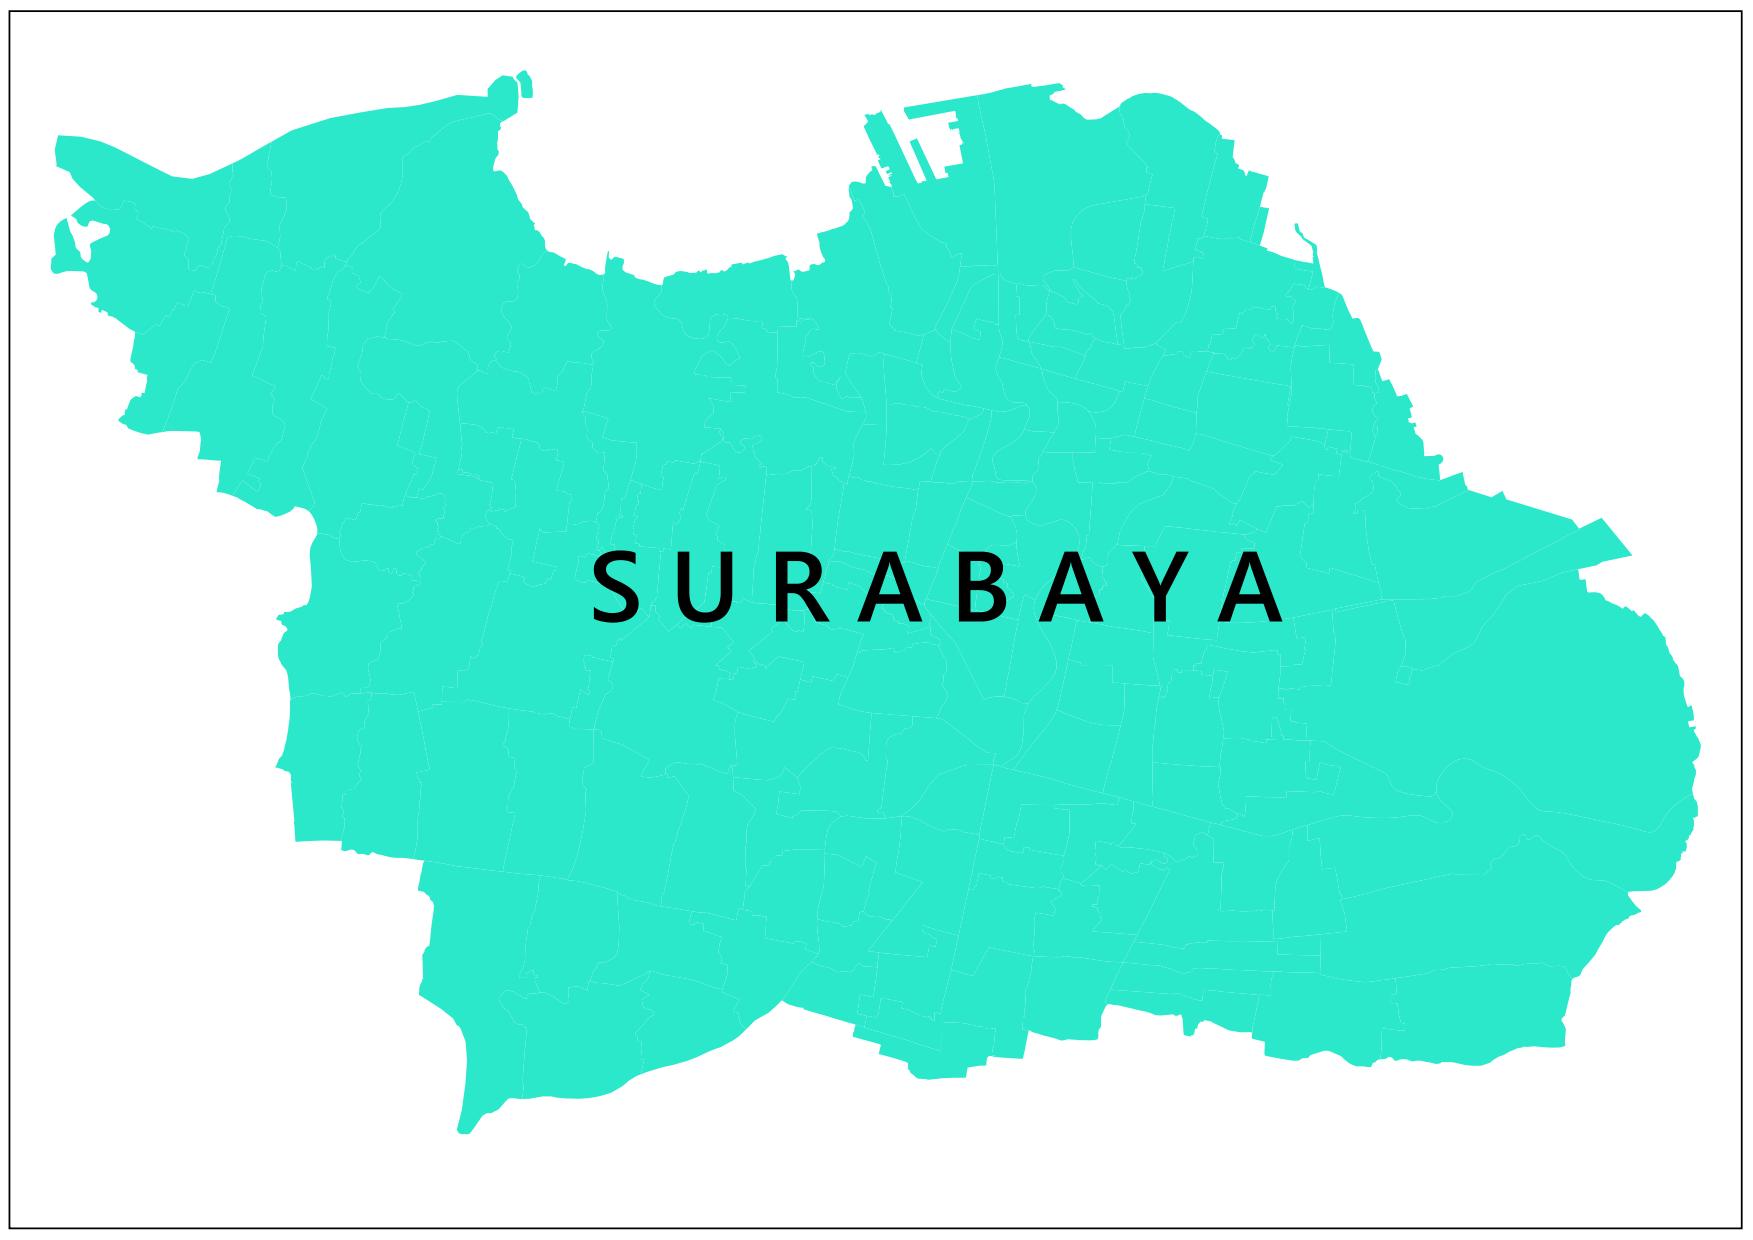 Sekilas Cerita Kampung-Kampung di Surabaya yang Memiliki Nilai Sejarah